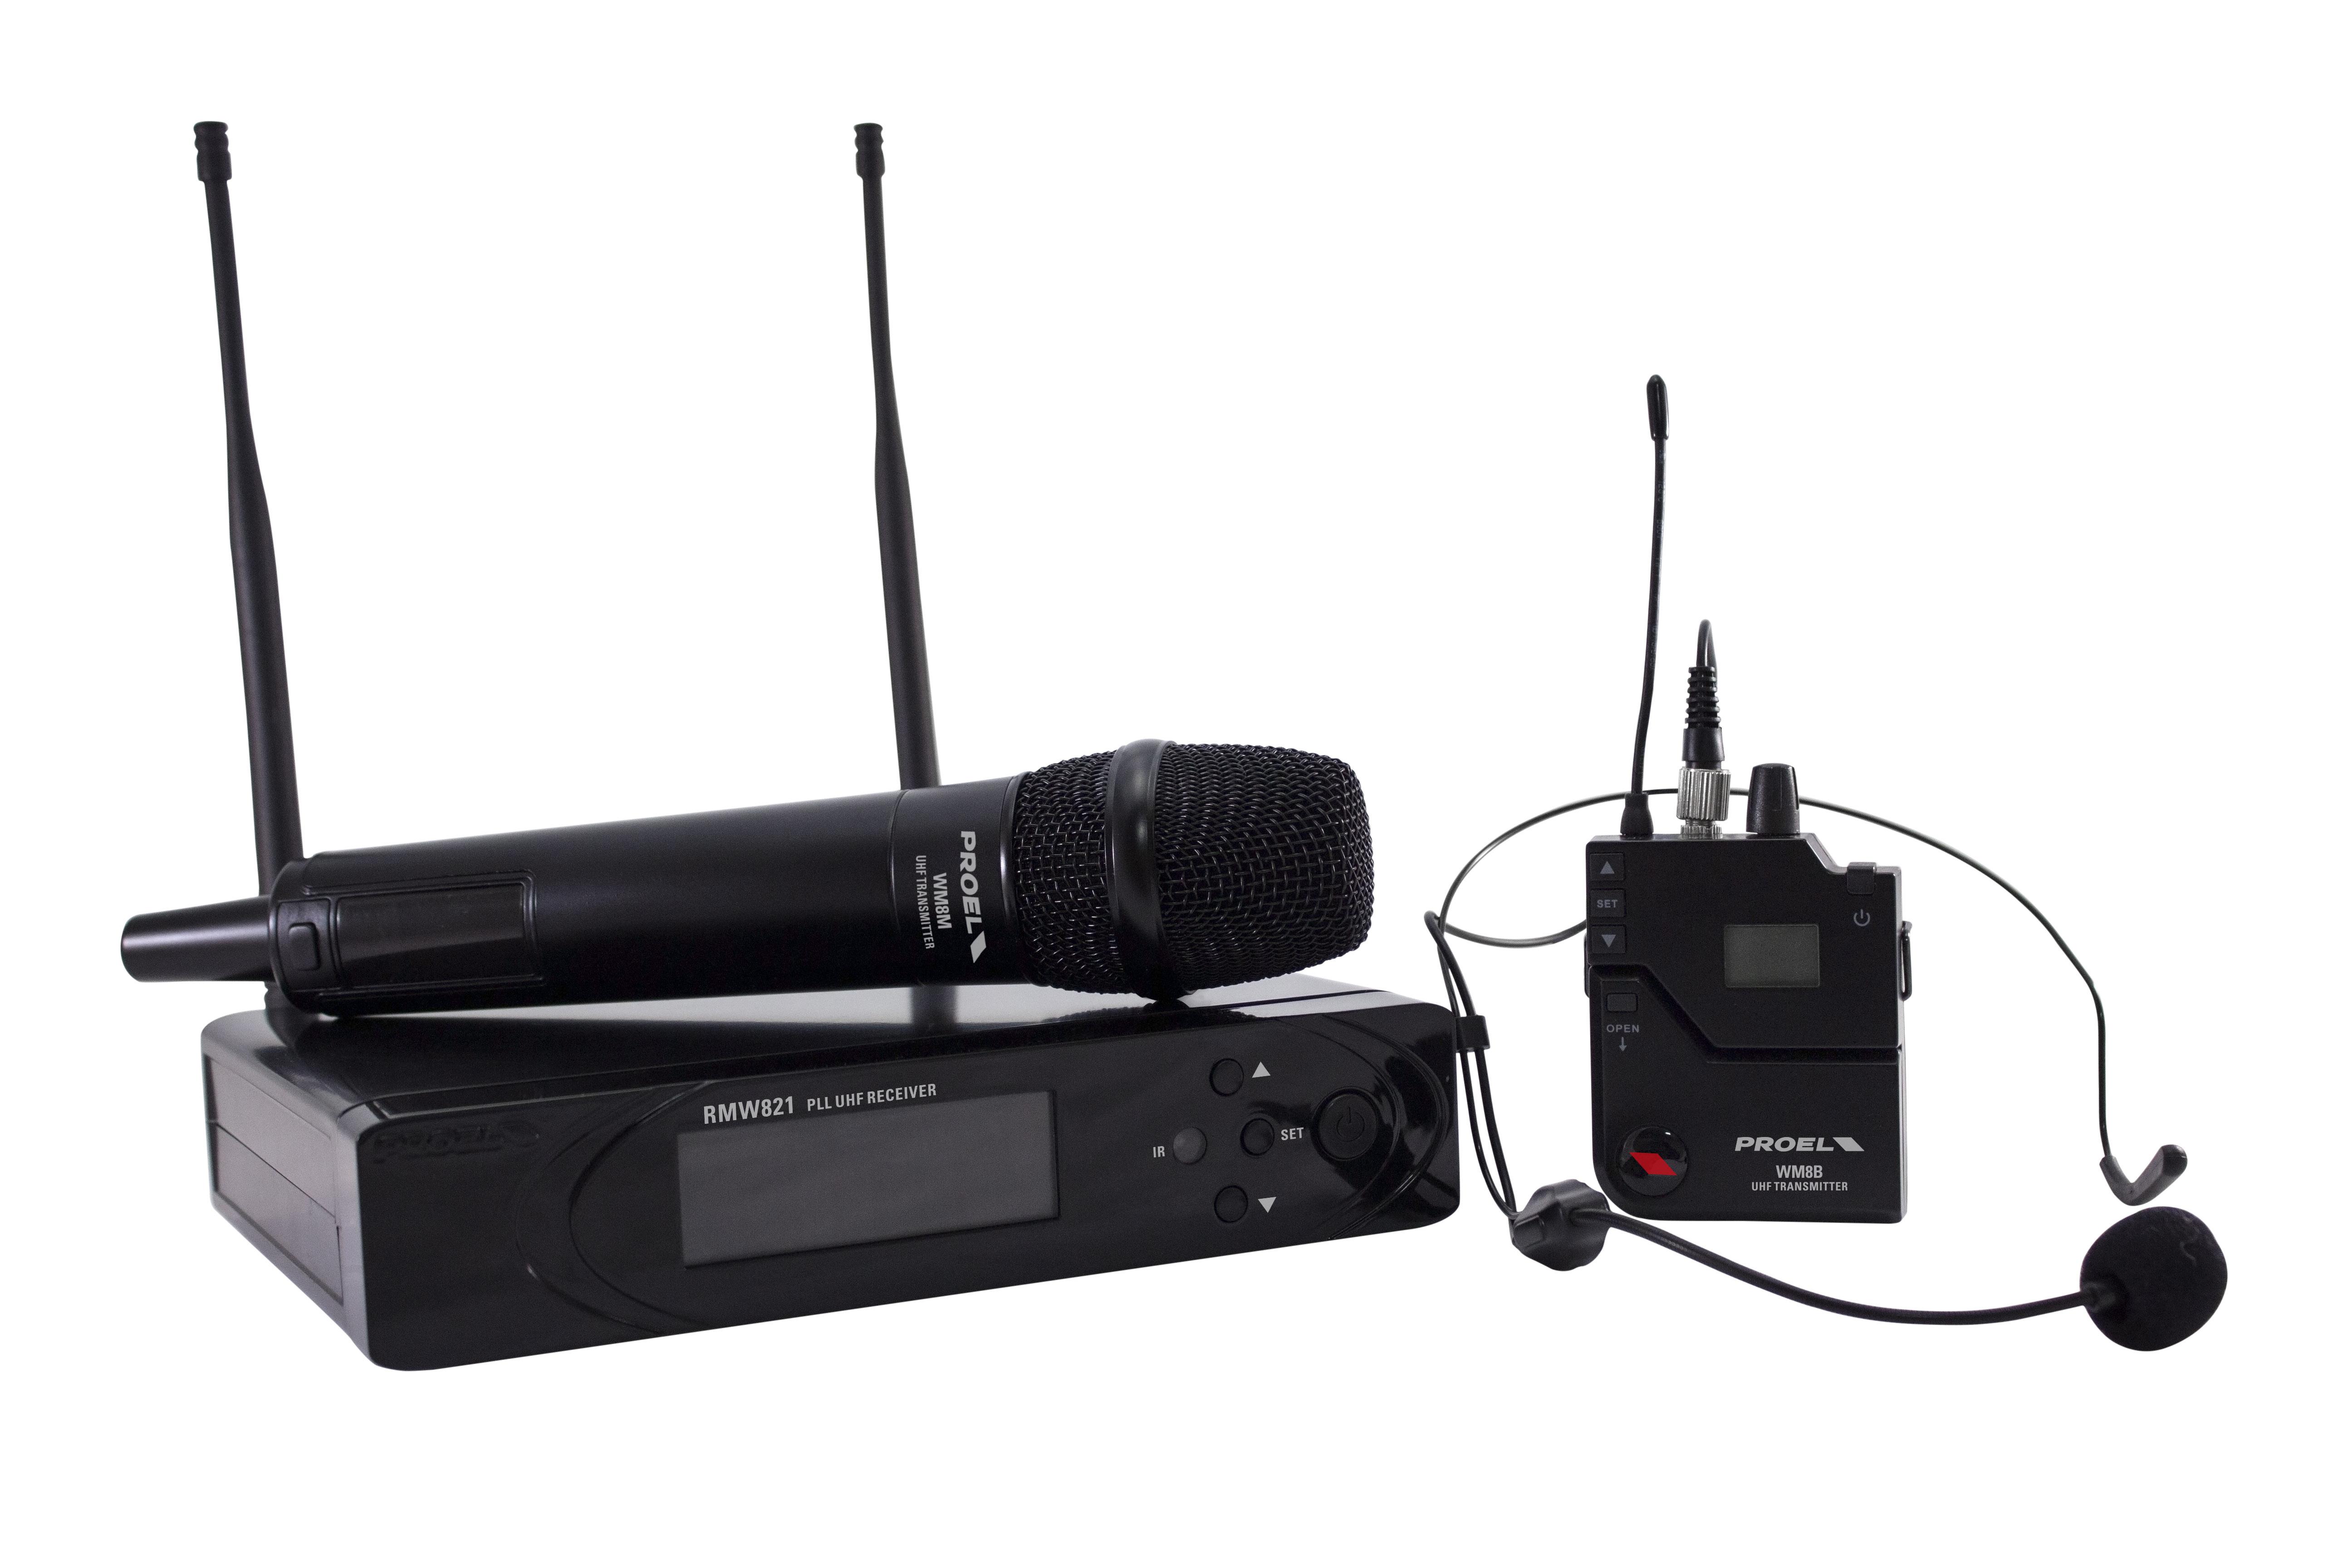 PROEL RMW821M - PLL UHF Wireless Handheld Microphone System